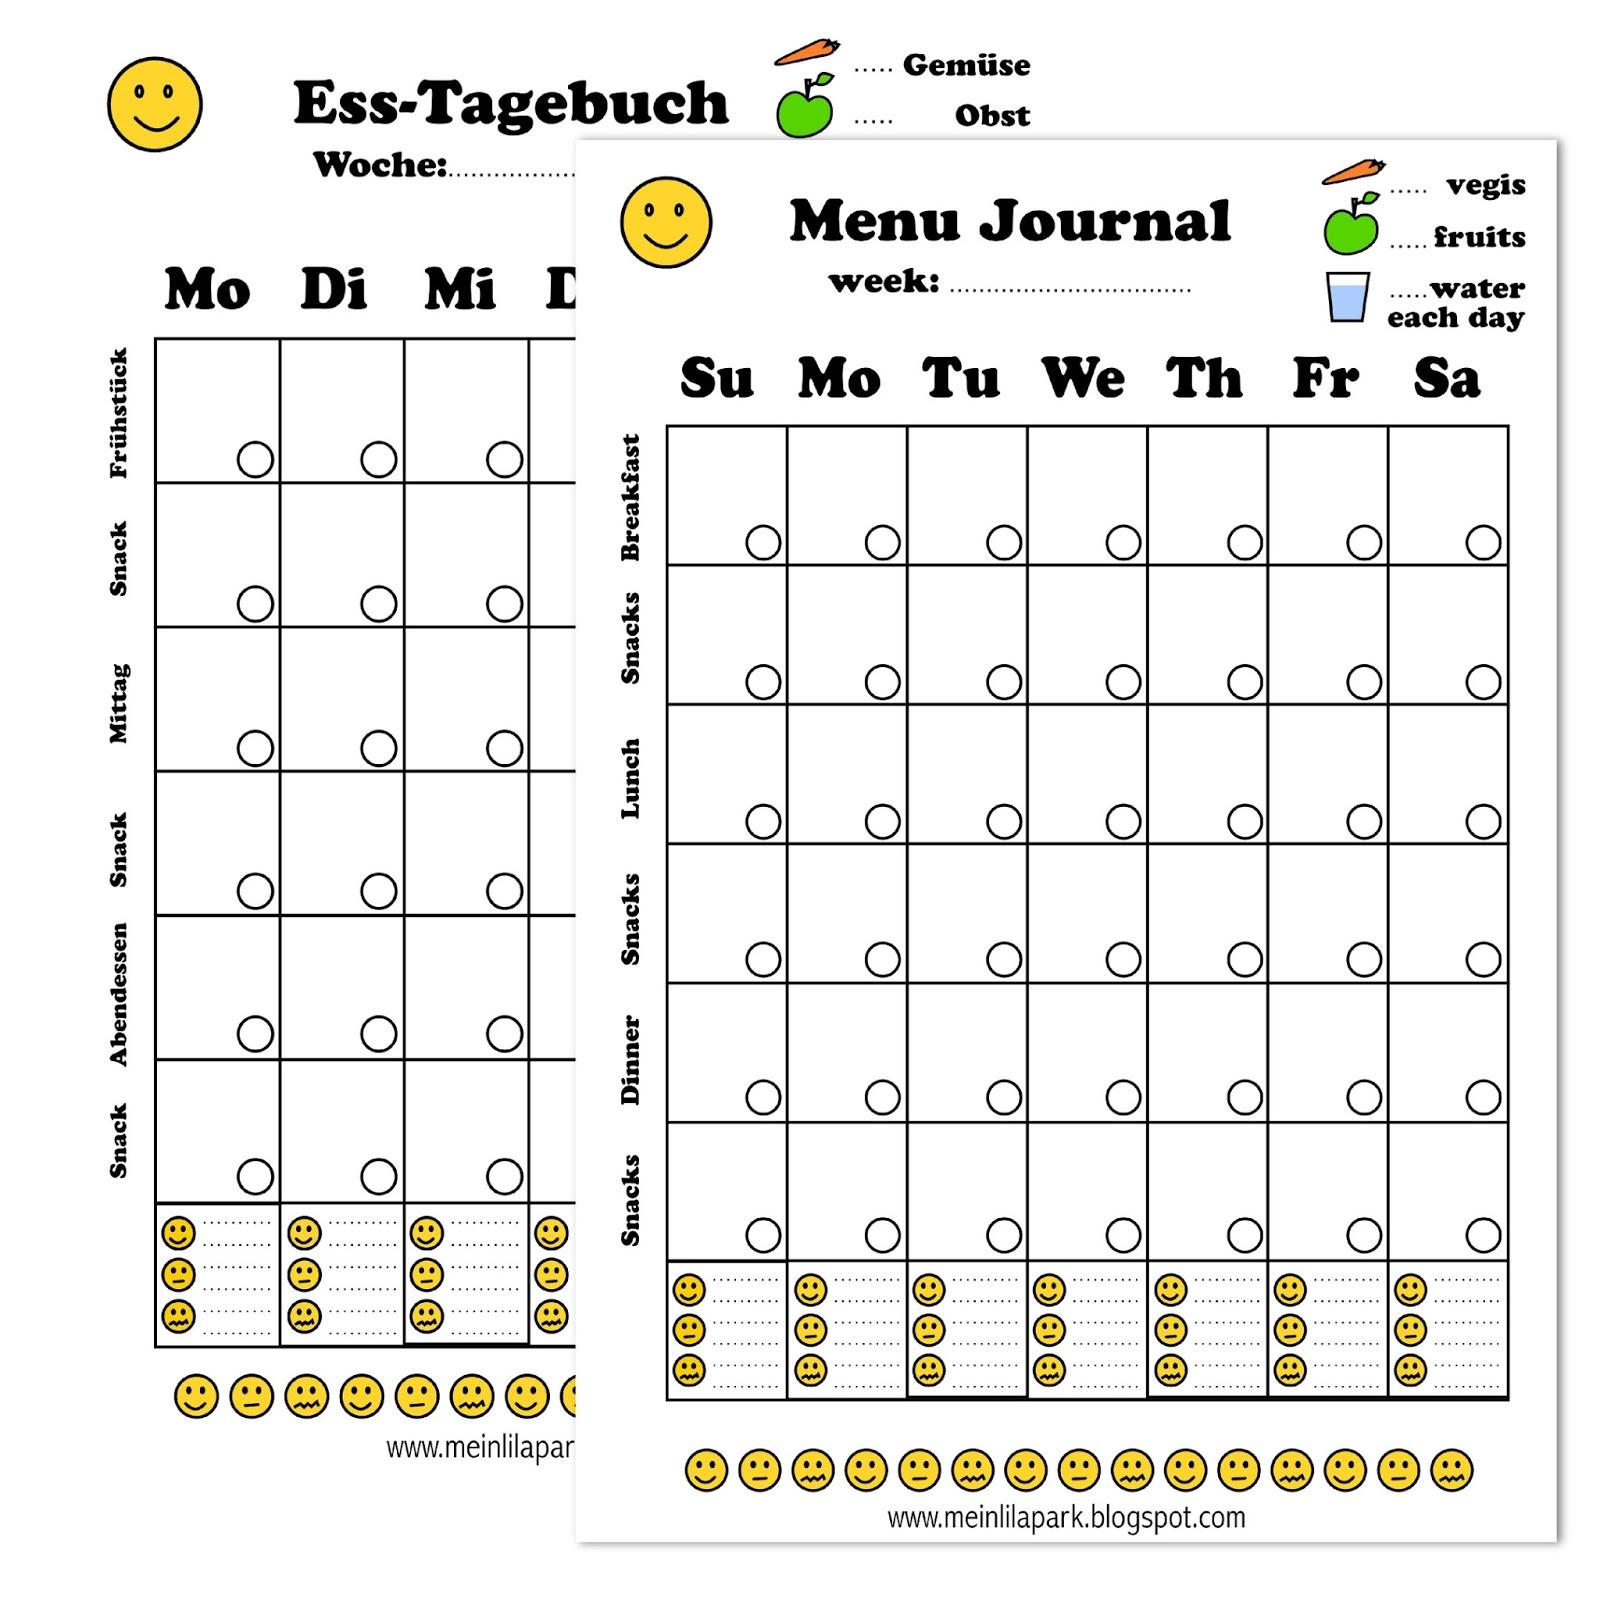 Free printable menu journal   ausdruckbares Diät Tagebuch